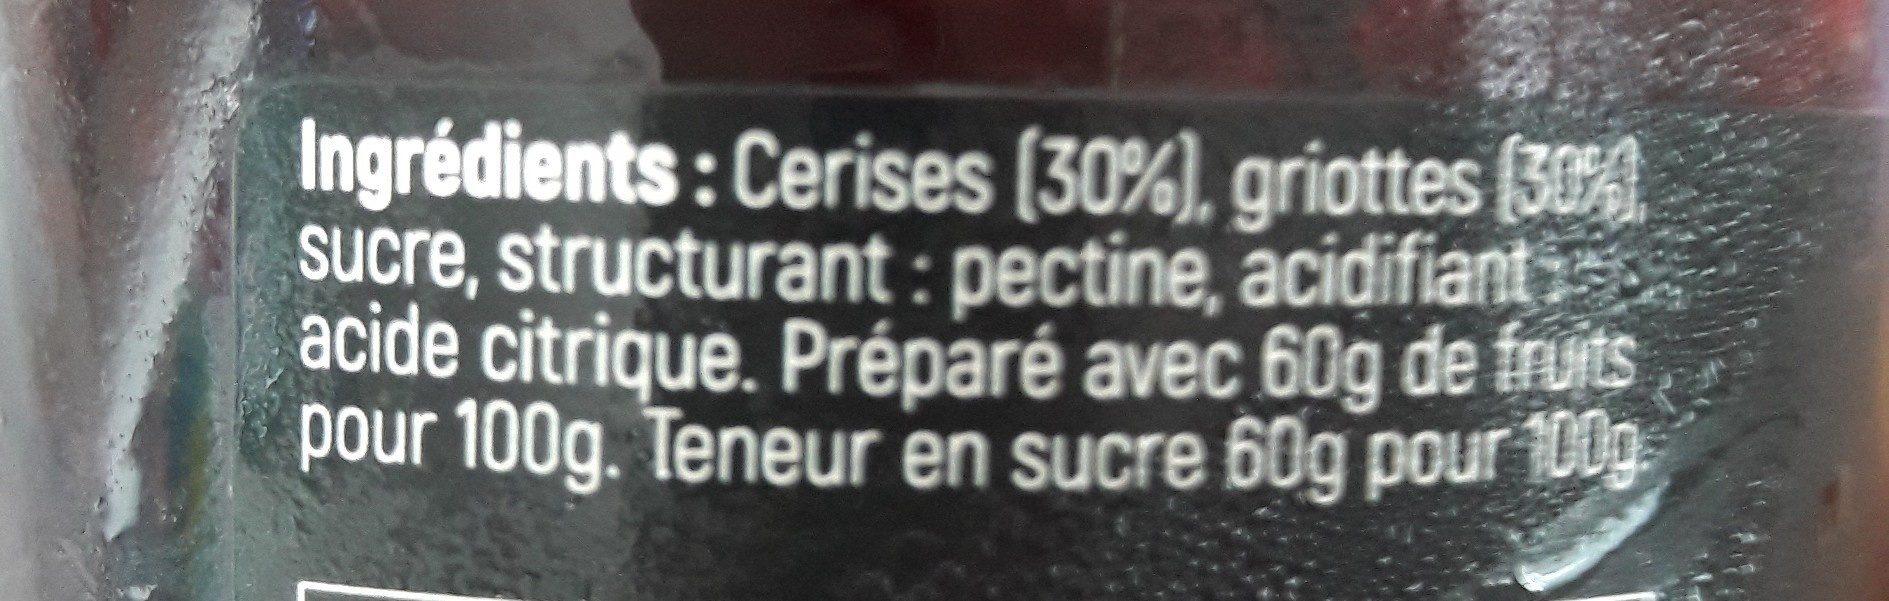 Confiture Cerise noire Griotte - Ingredients - fr